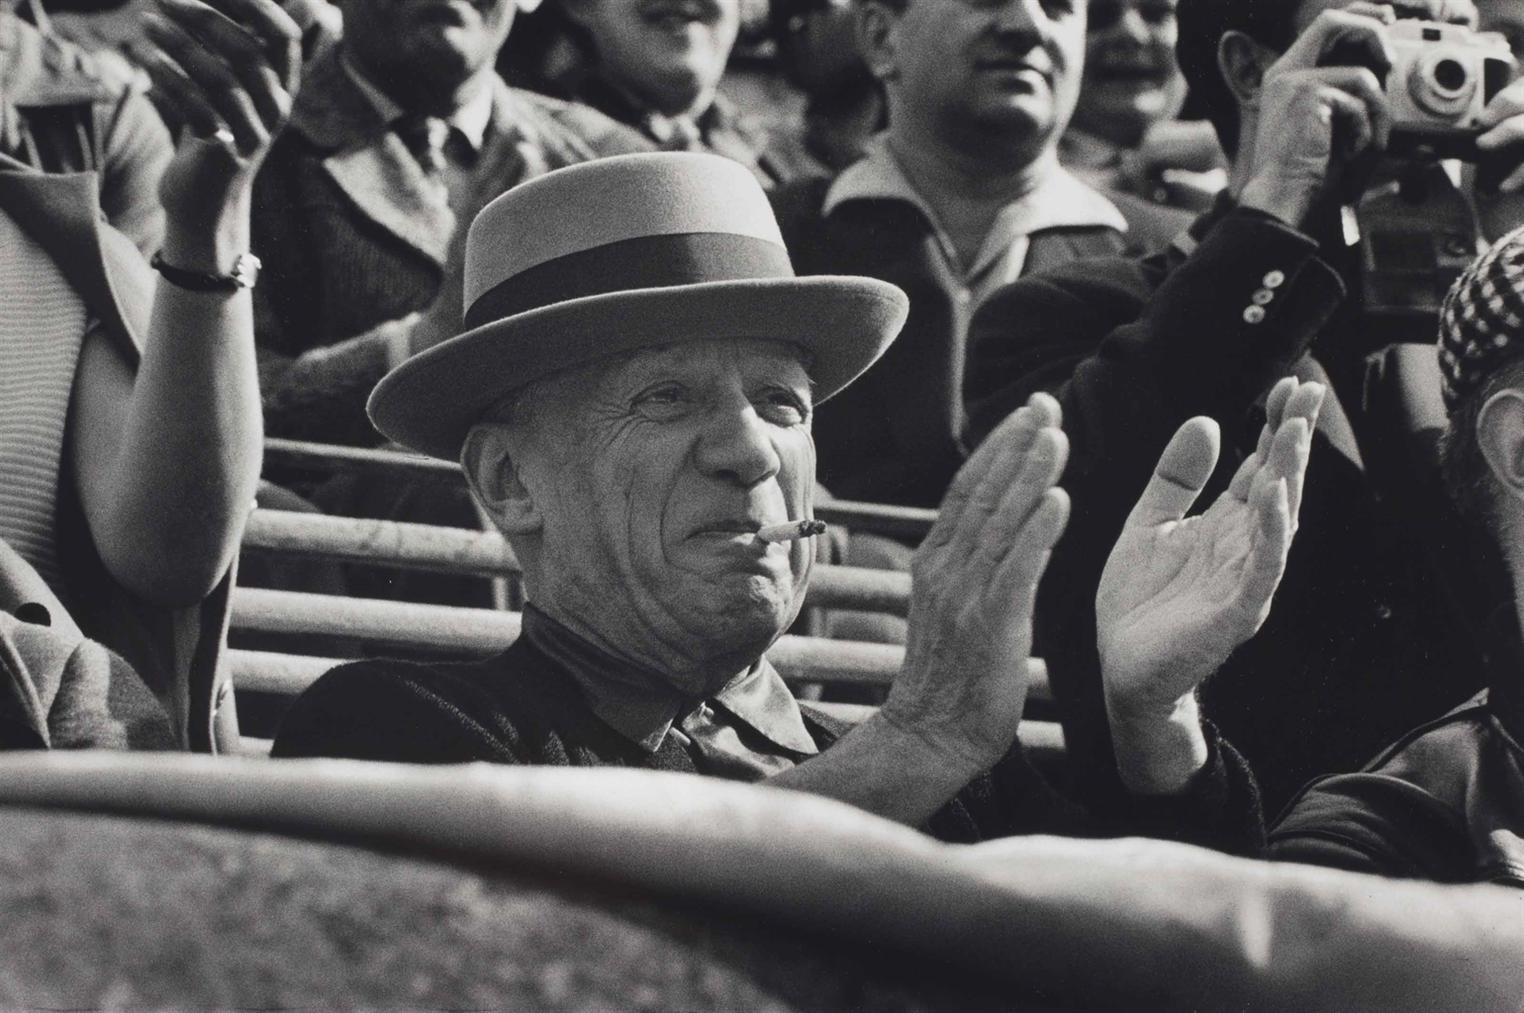 Rene Burri-Pablo Picasso, Nimes France-1957